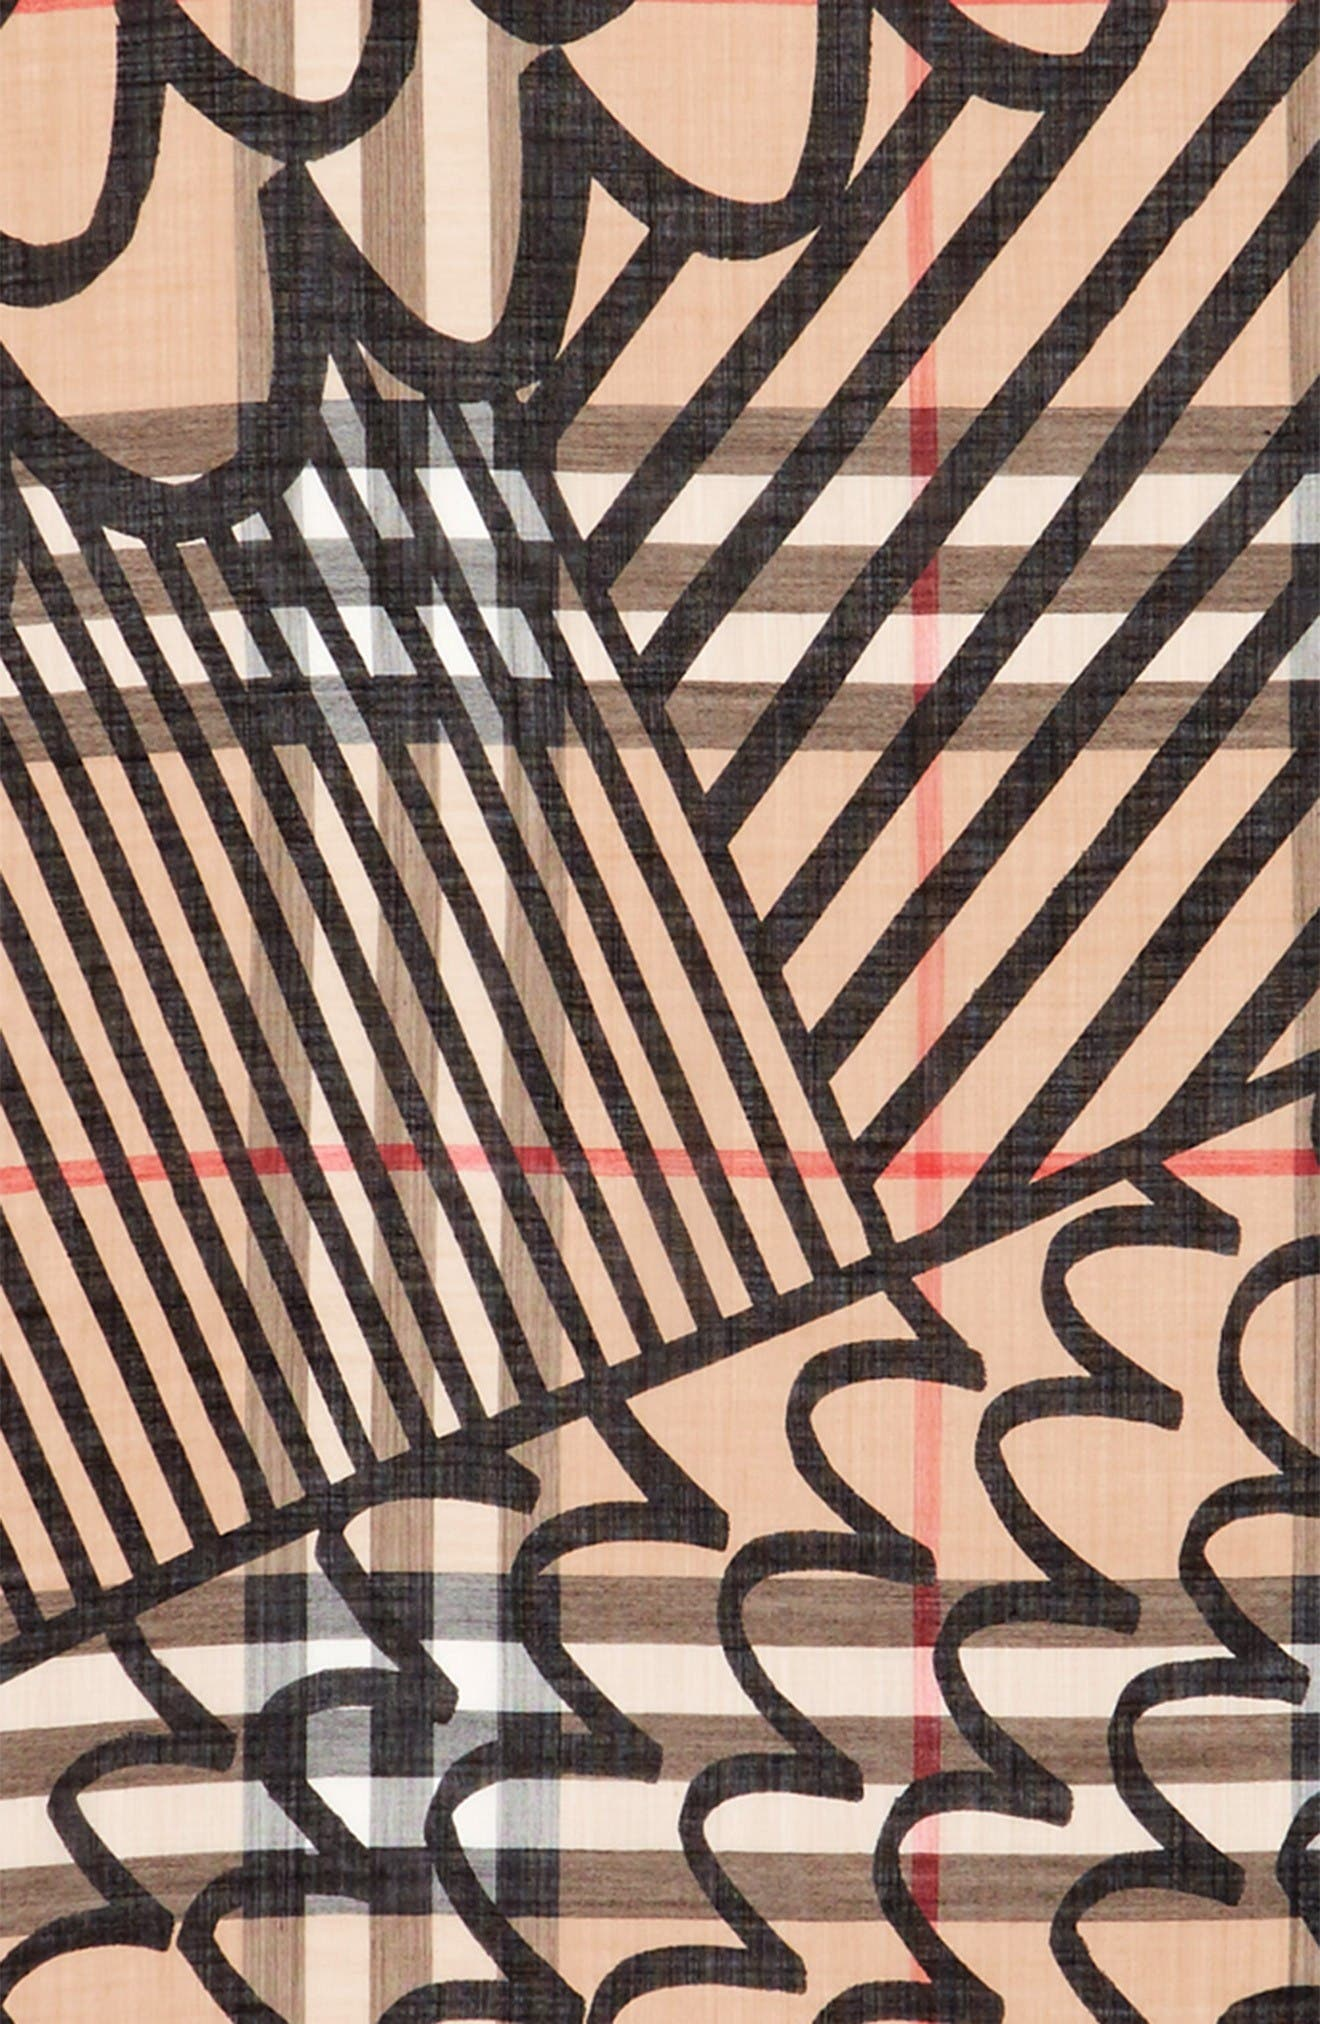 Patchwork Gauze Check Scarf,                             Alternate thumbnail 3, color,                             Camel/ Black